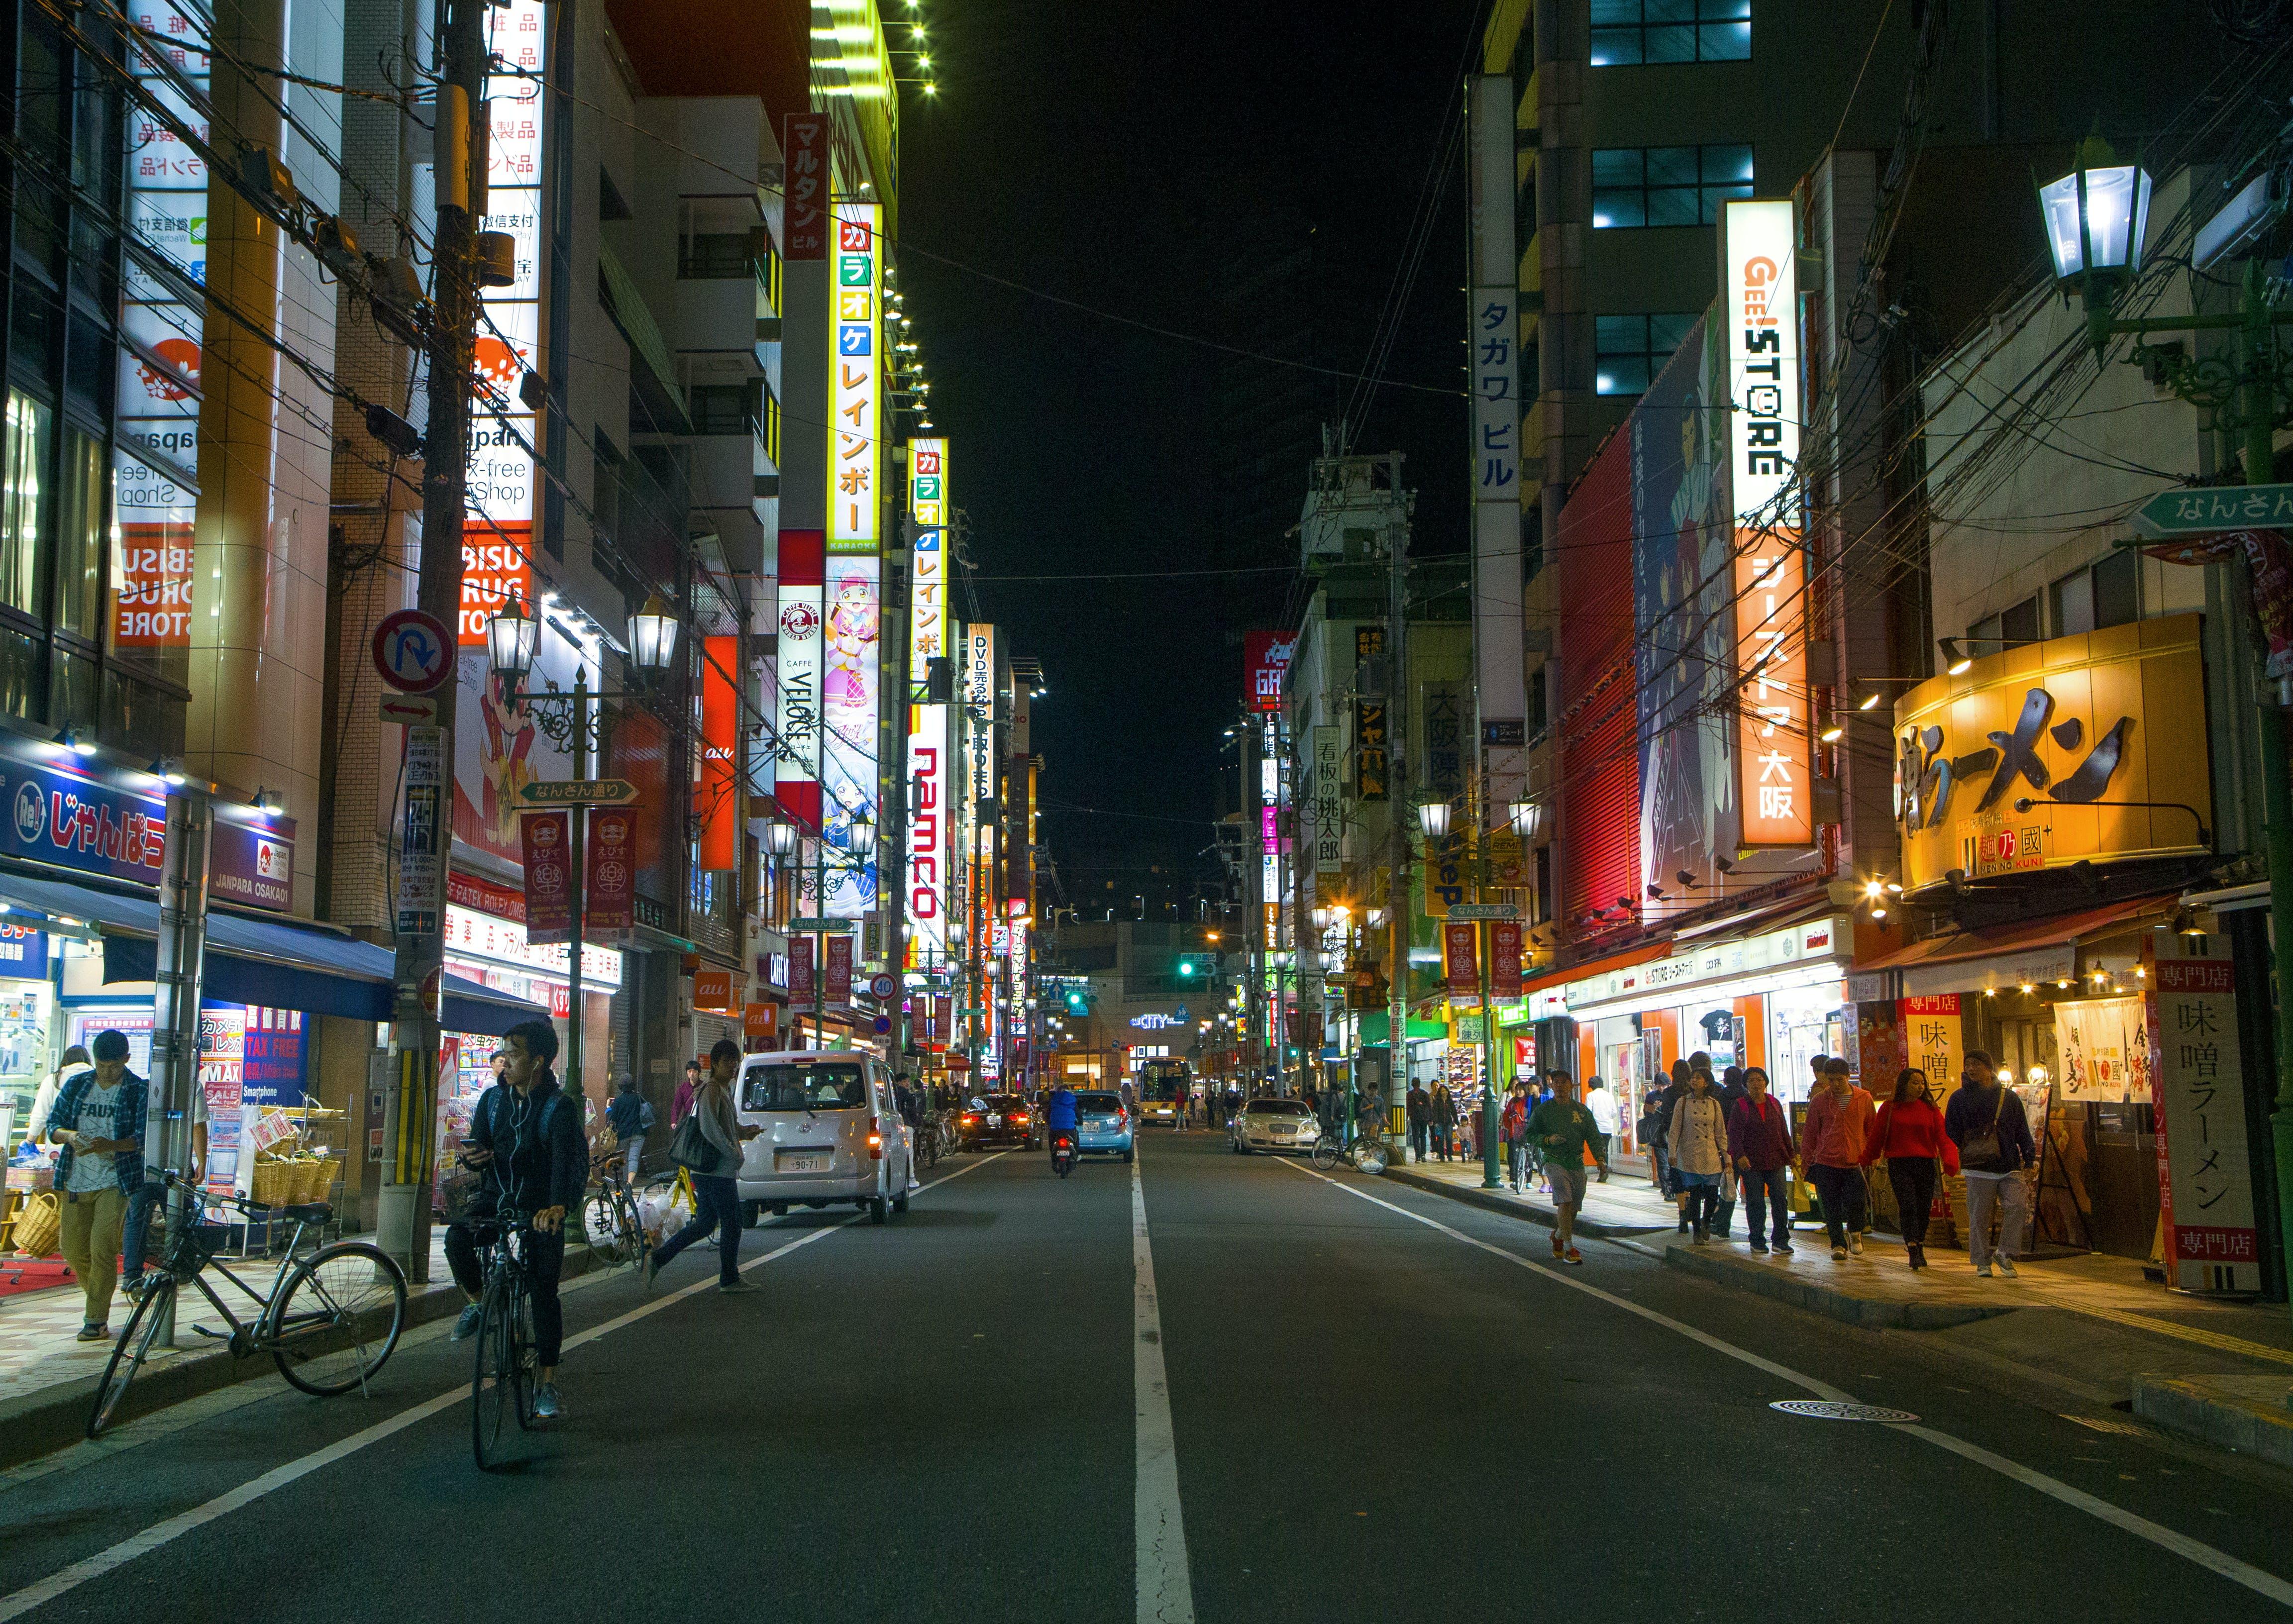 city lights, metropolis, neourban